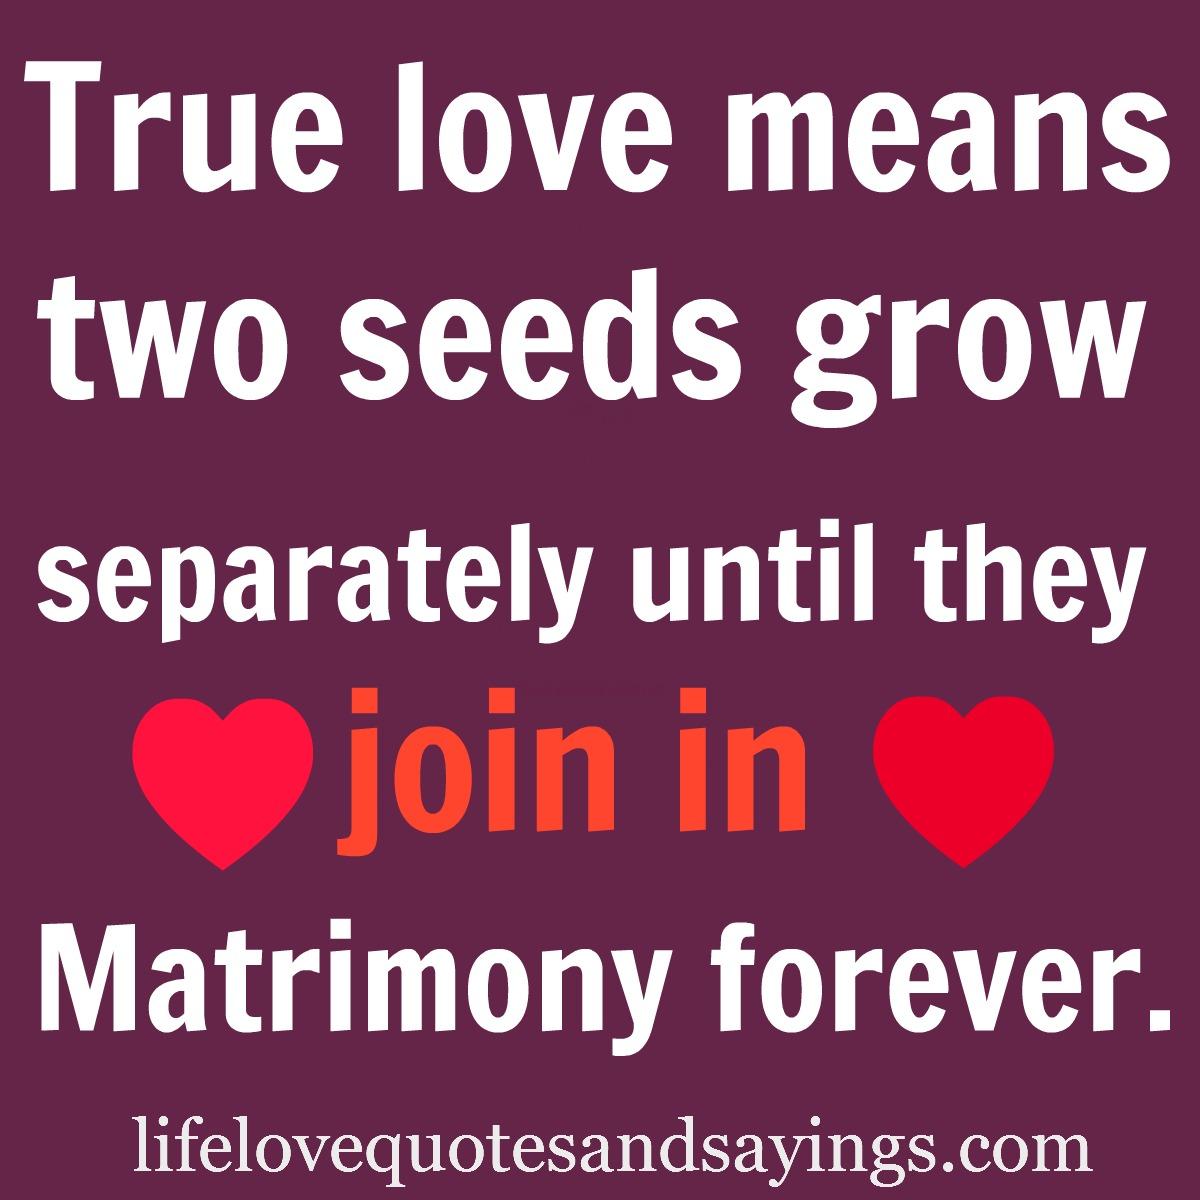 True Love Quotes: True Love Quotes. QuotesGram